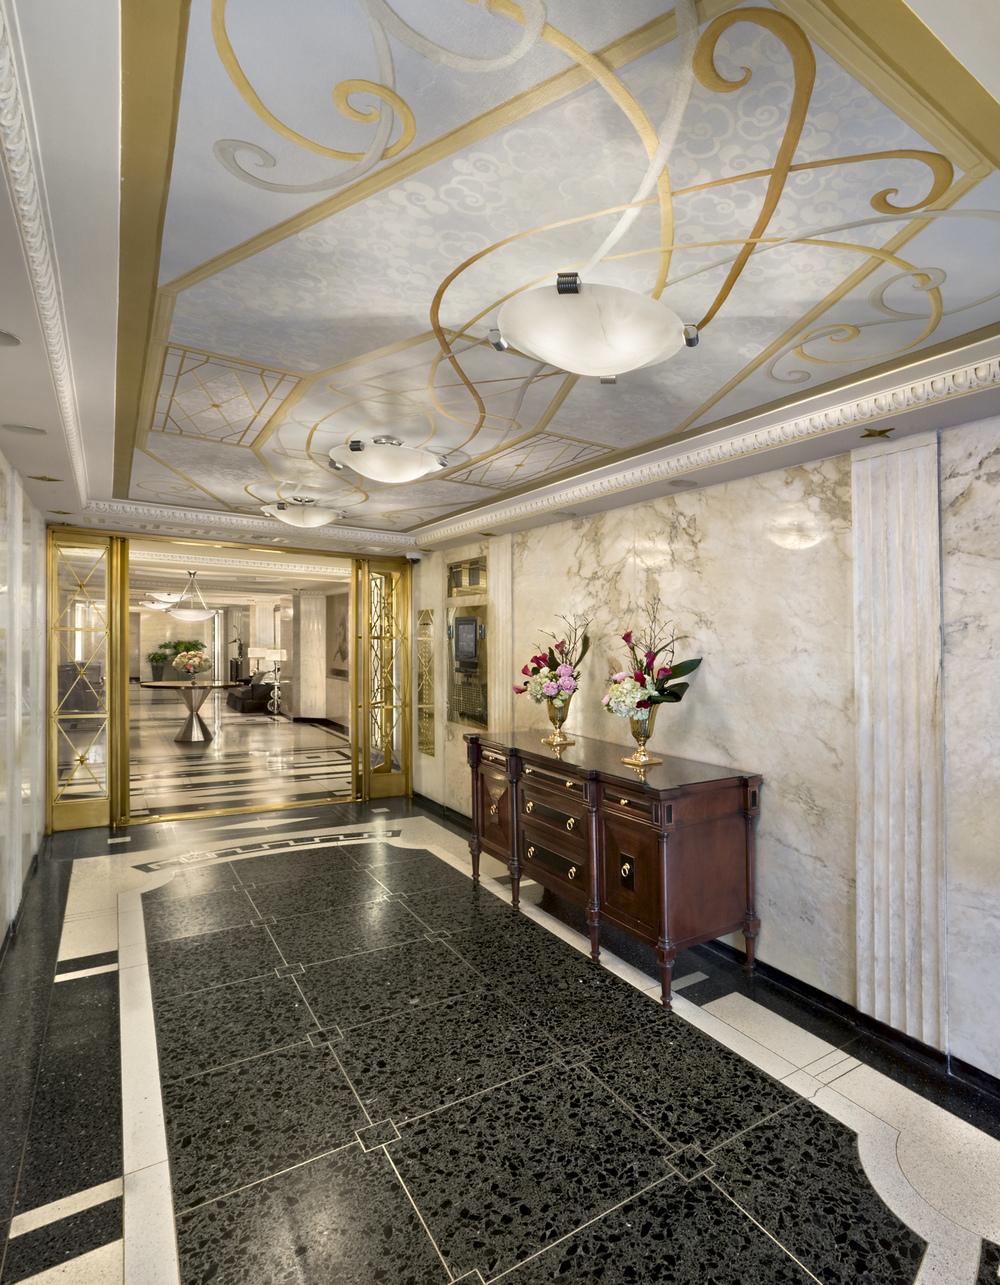 737 Park Avenue 737 park avenue — design - interior design firm - new york - tobin